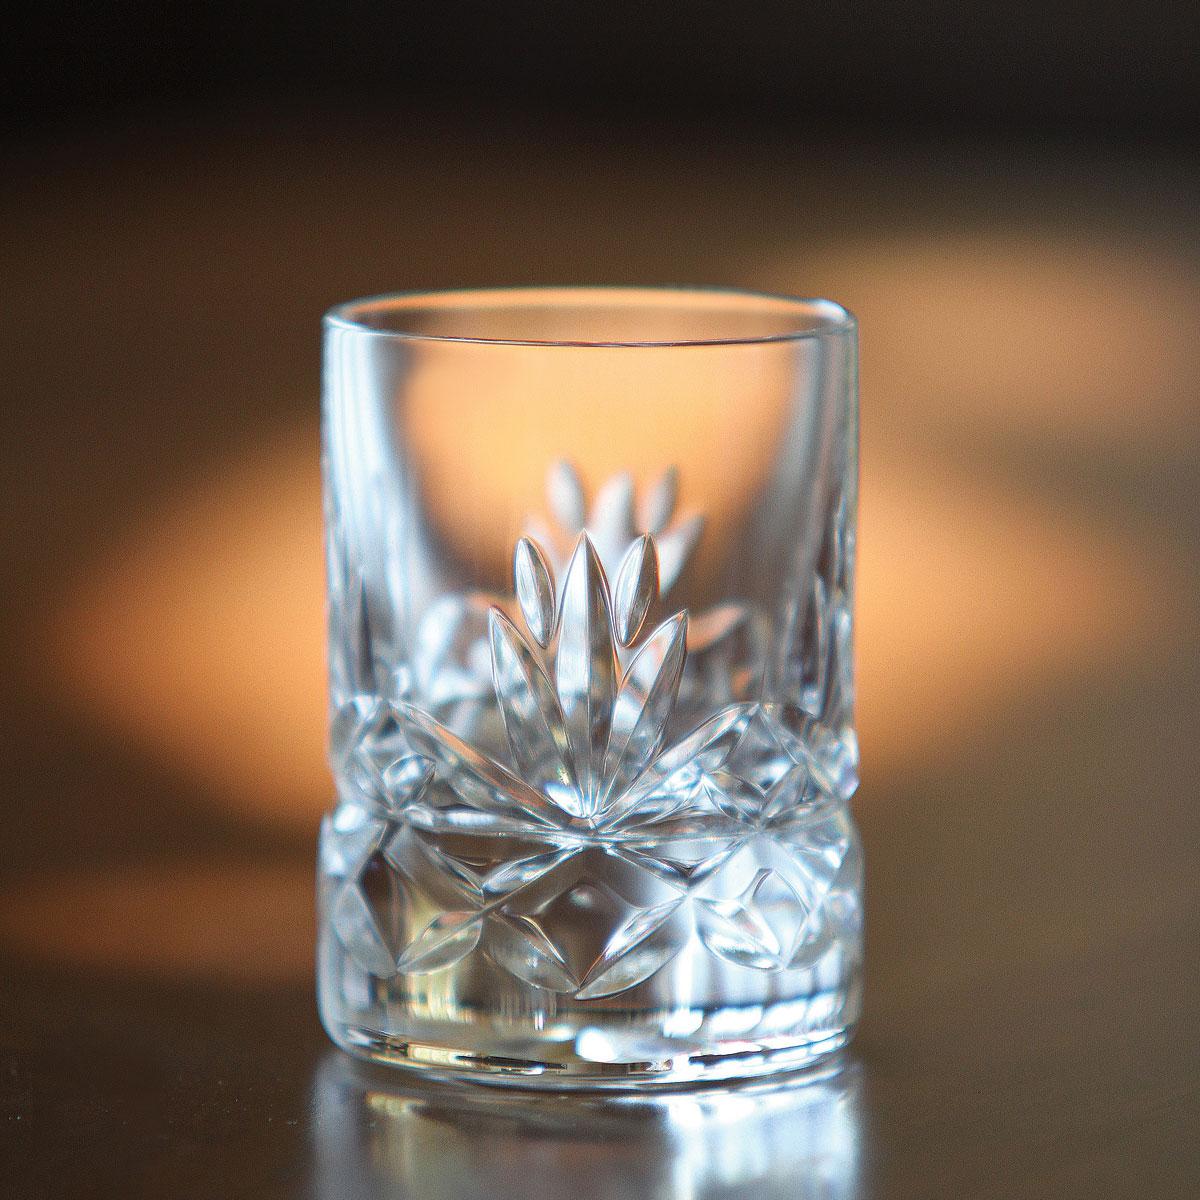 Cashs Ireland, Annestown Crystal Shot Glass